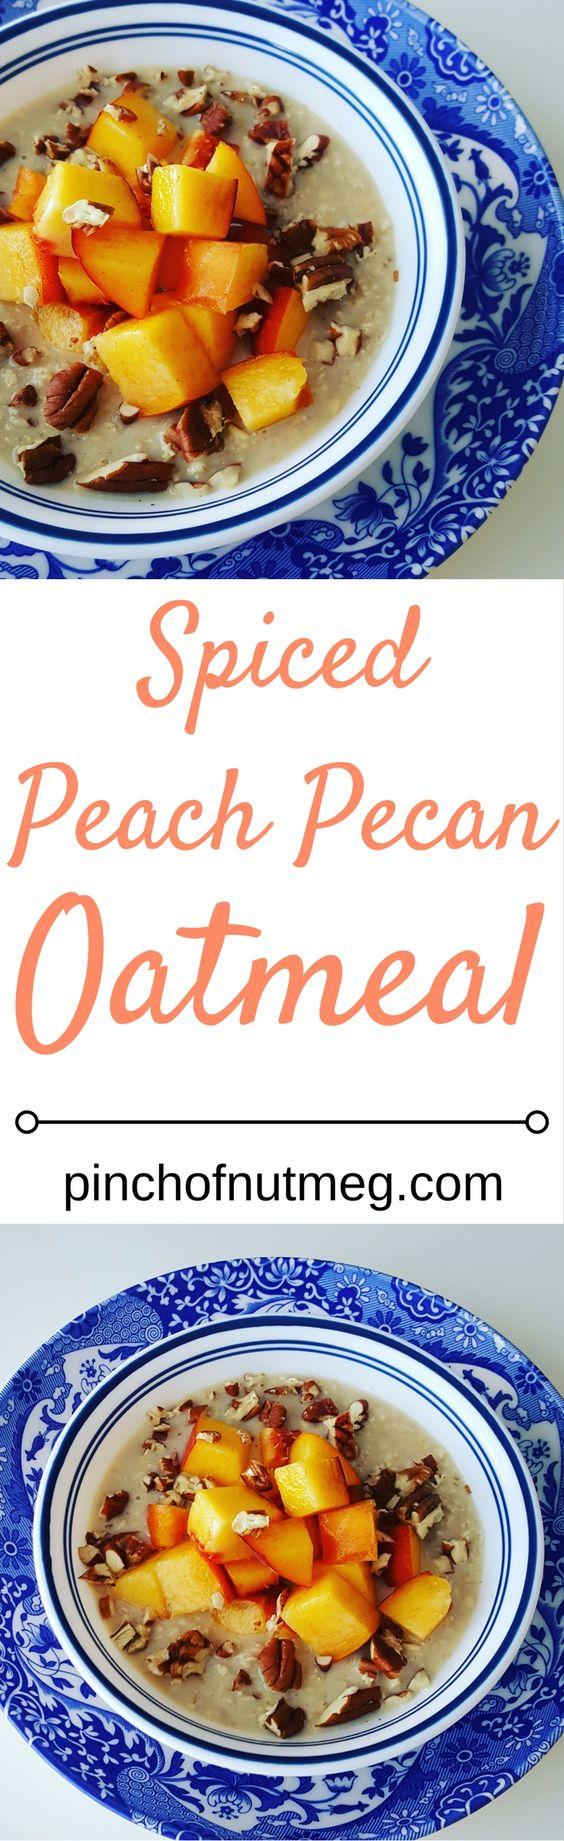 spiced peach pecan oatmeal: